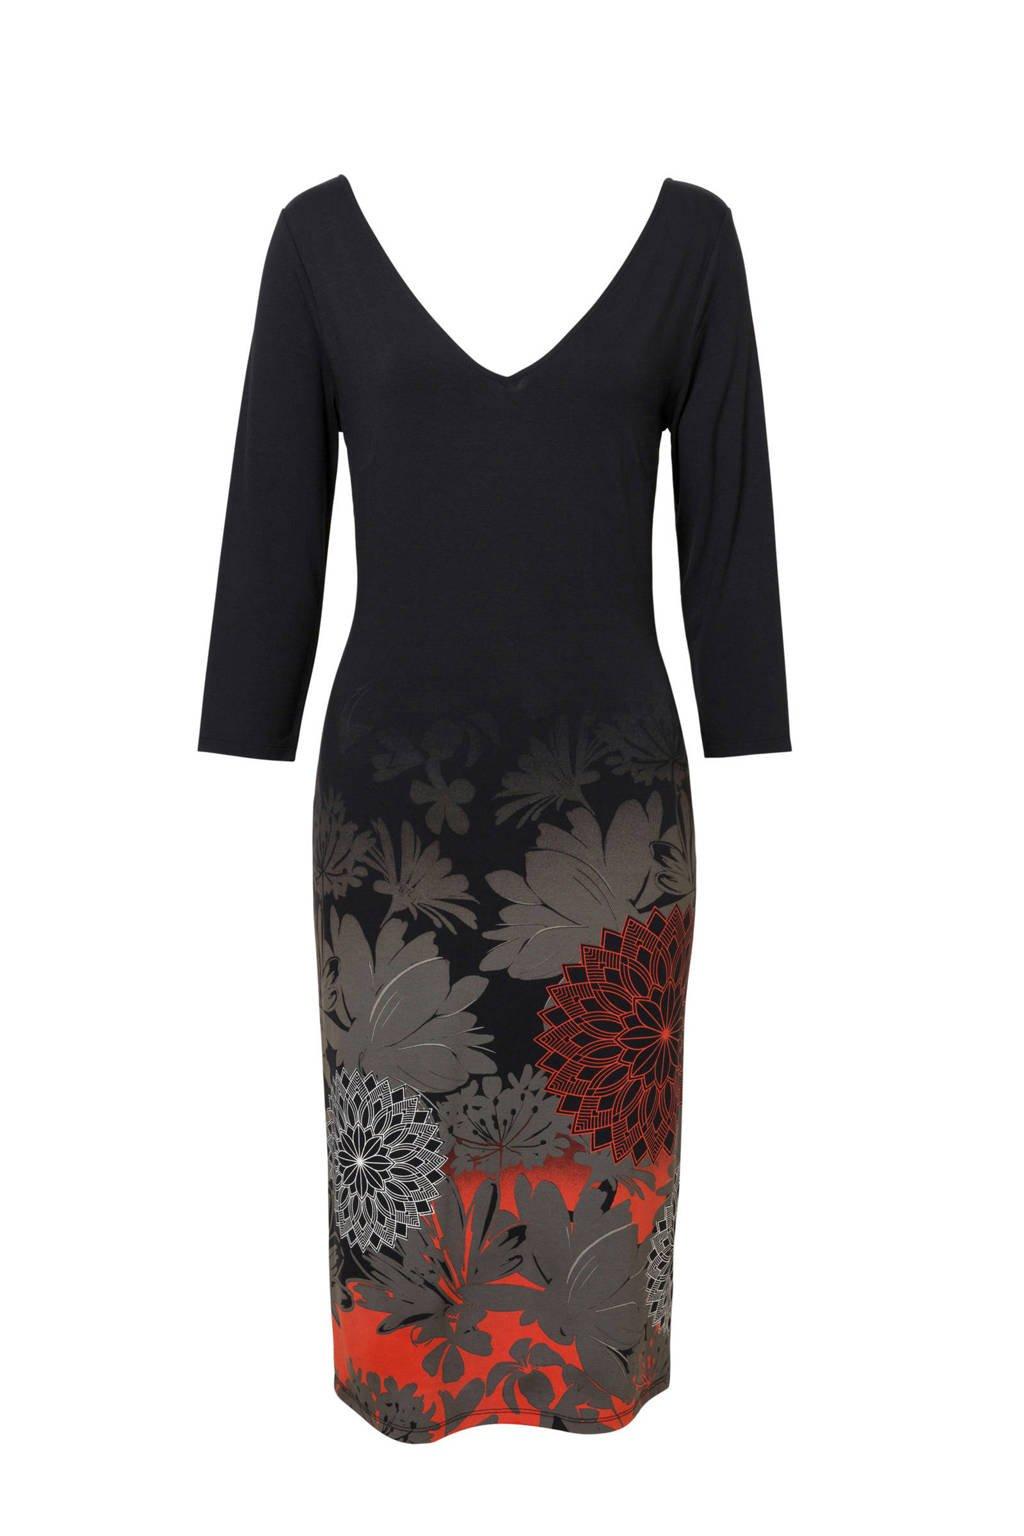 Desigual jurk met bloemenprint zwart, Zwart